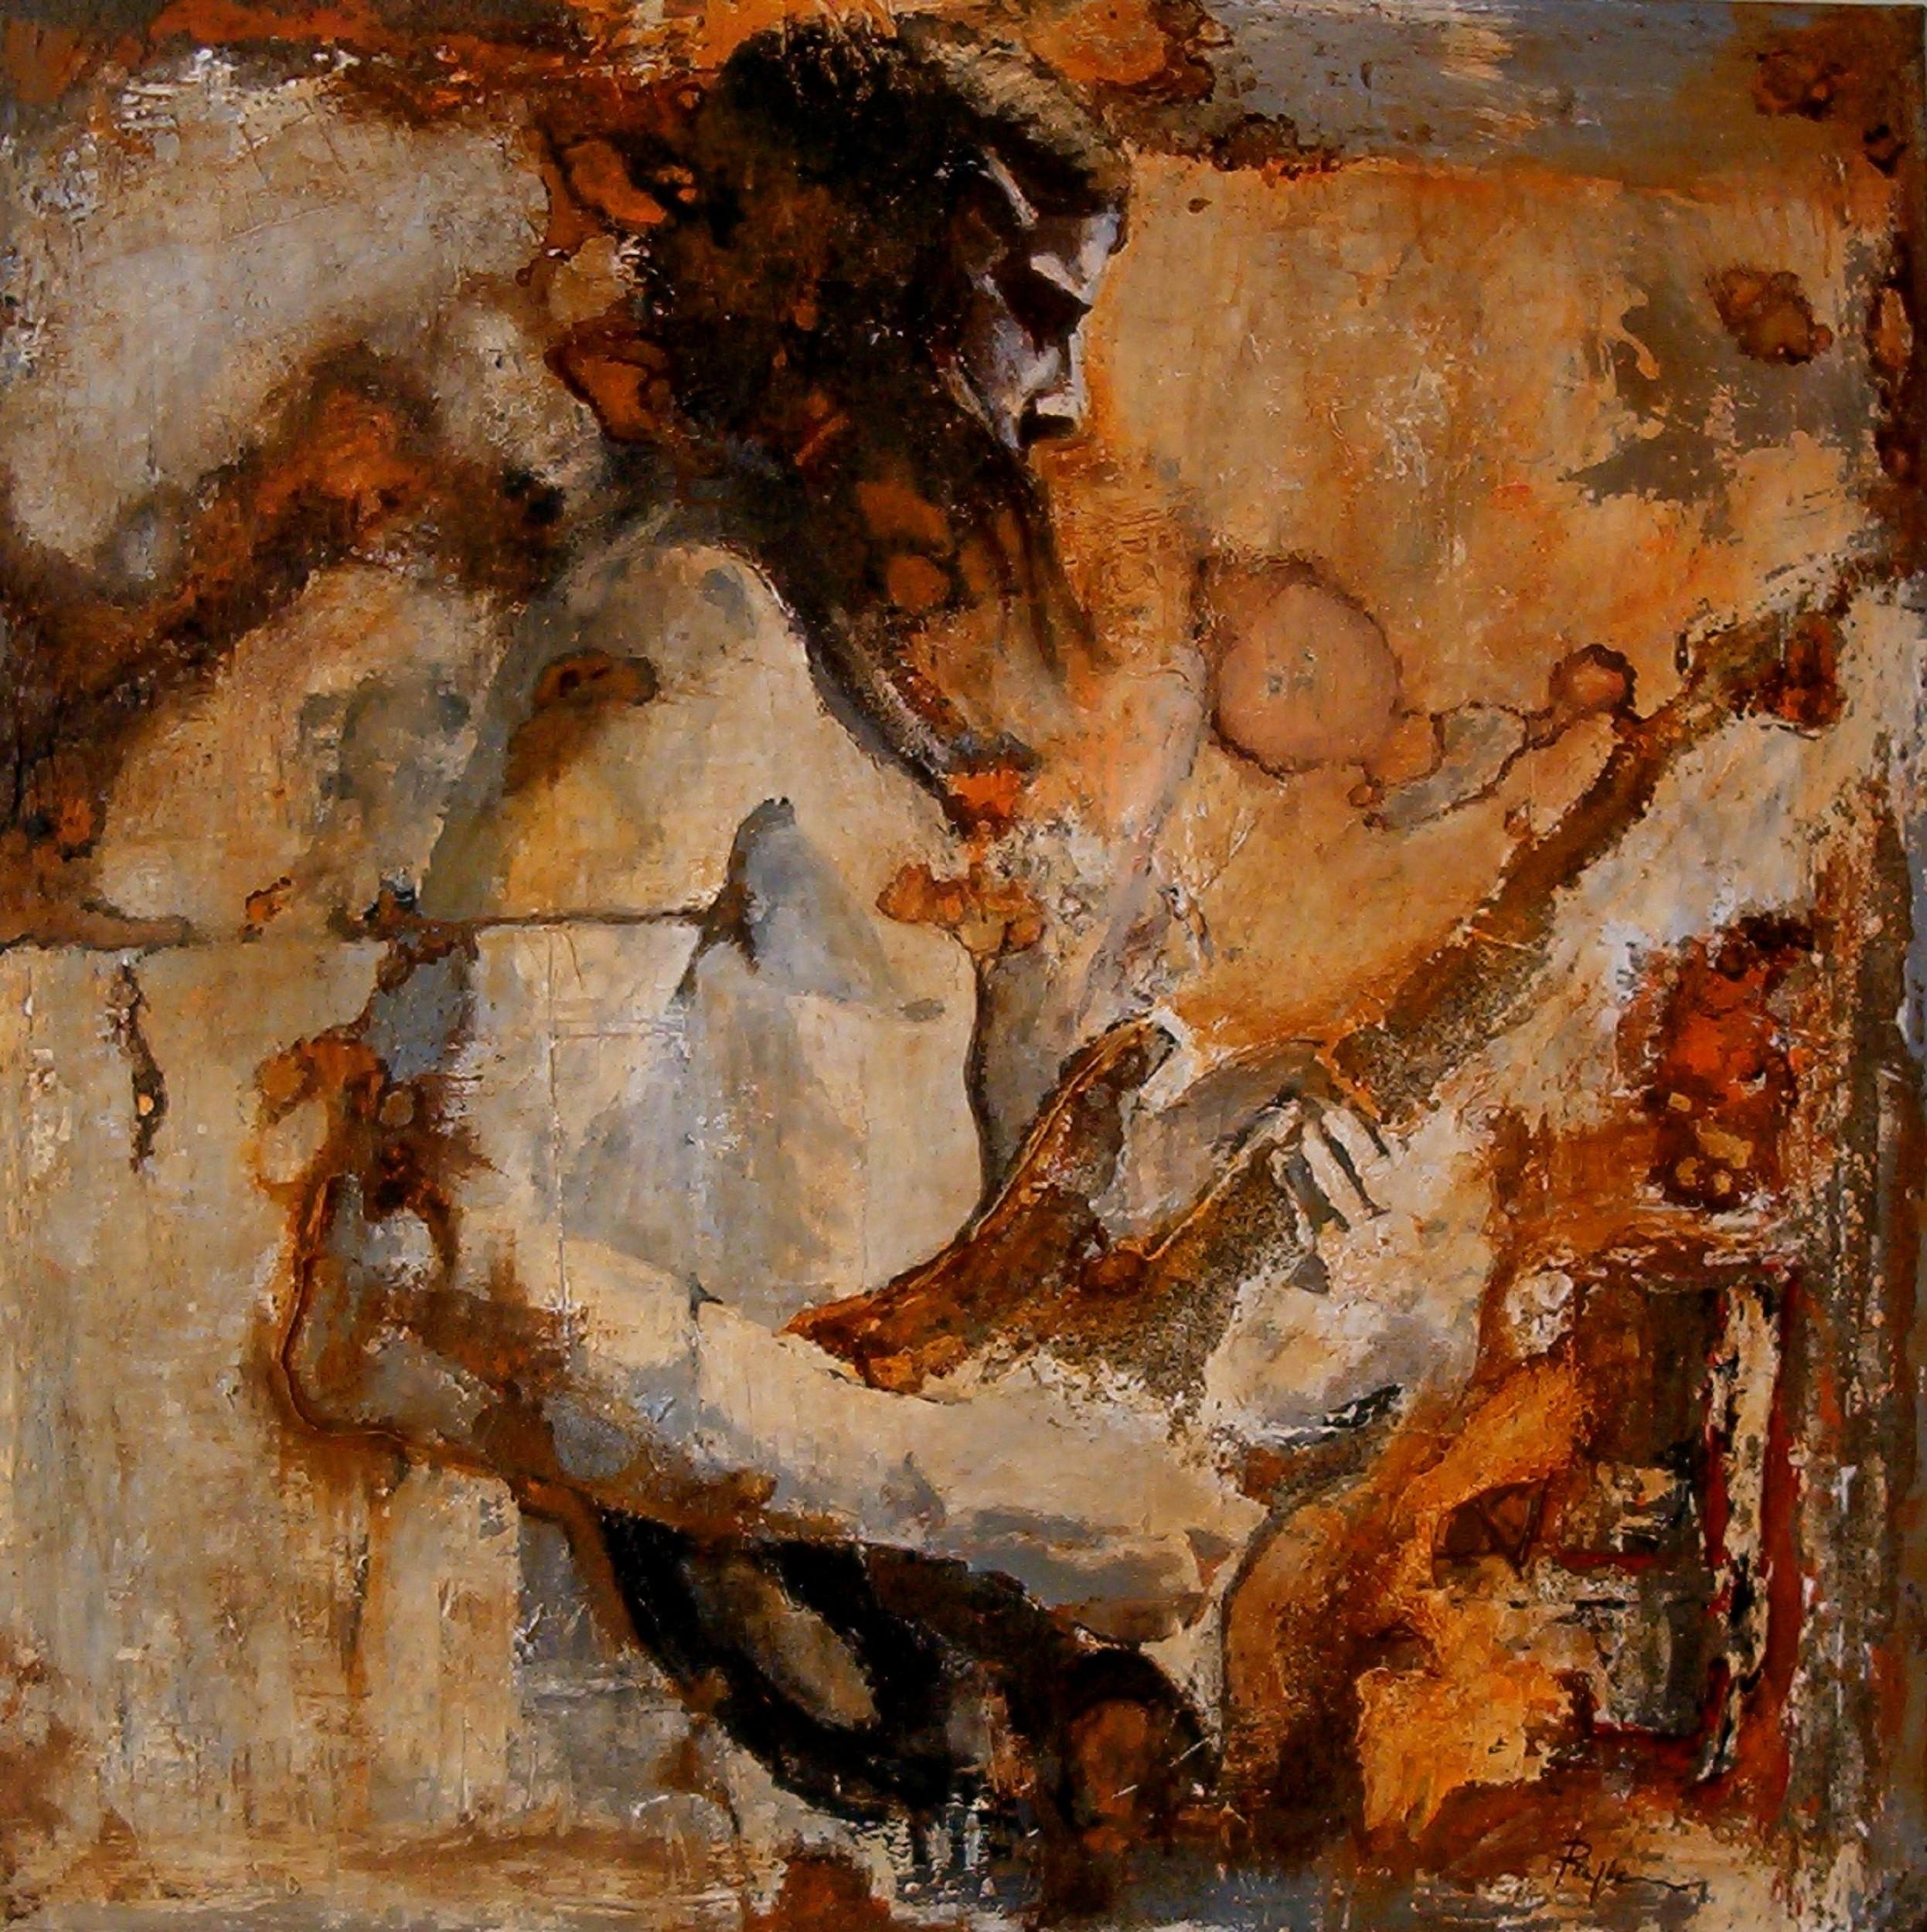 Rust David Gilmour Live At Pompeii Pasquale Rapicano